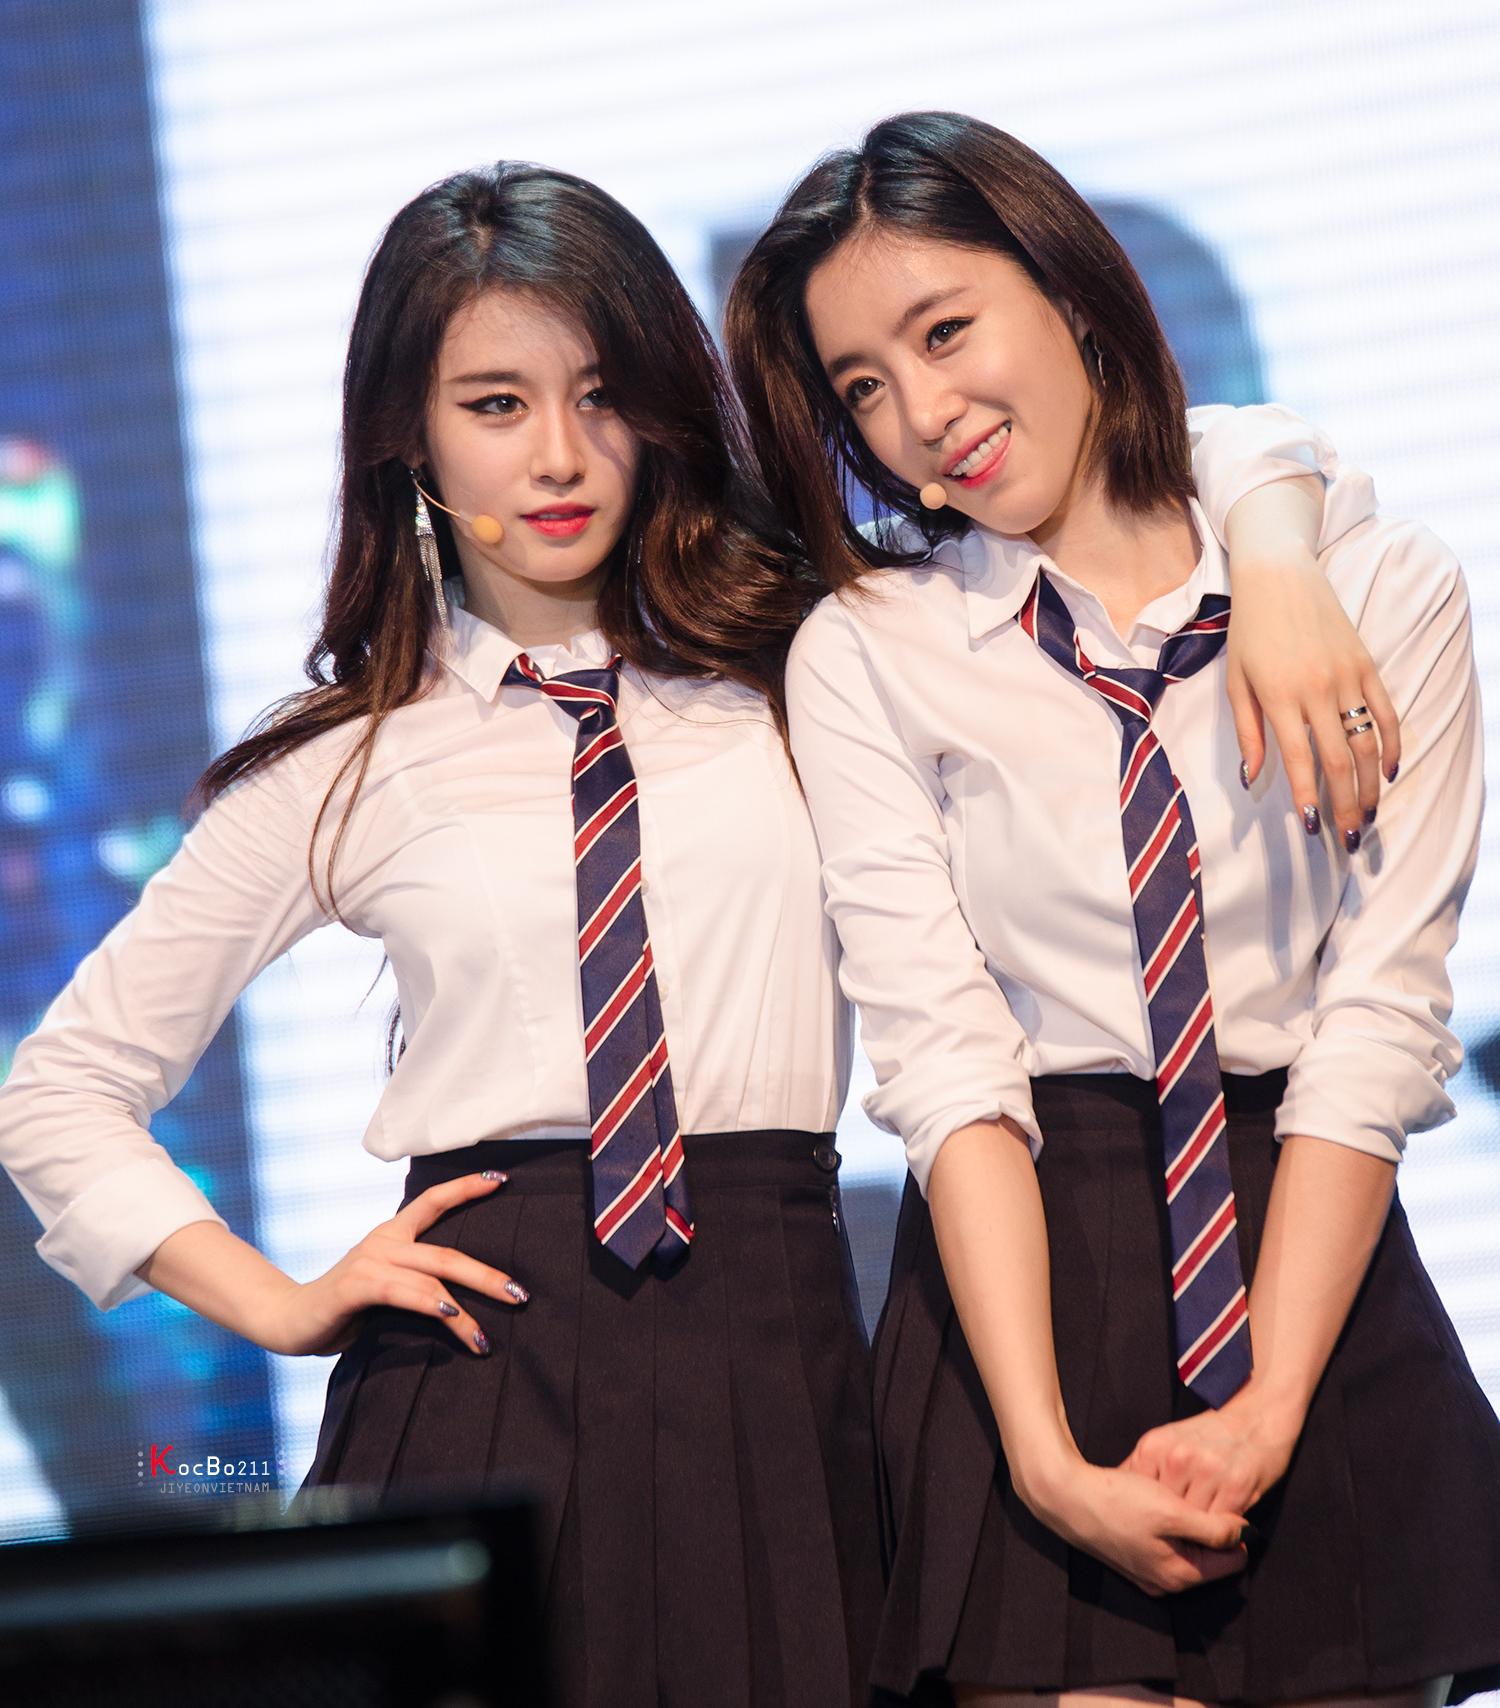 jiyeon and eunjung relationship quizzes